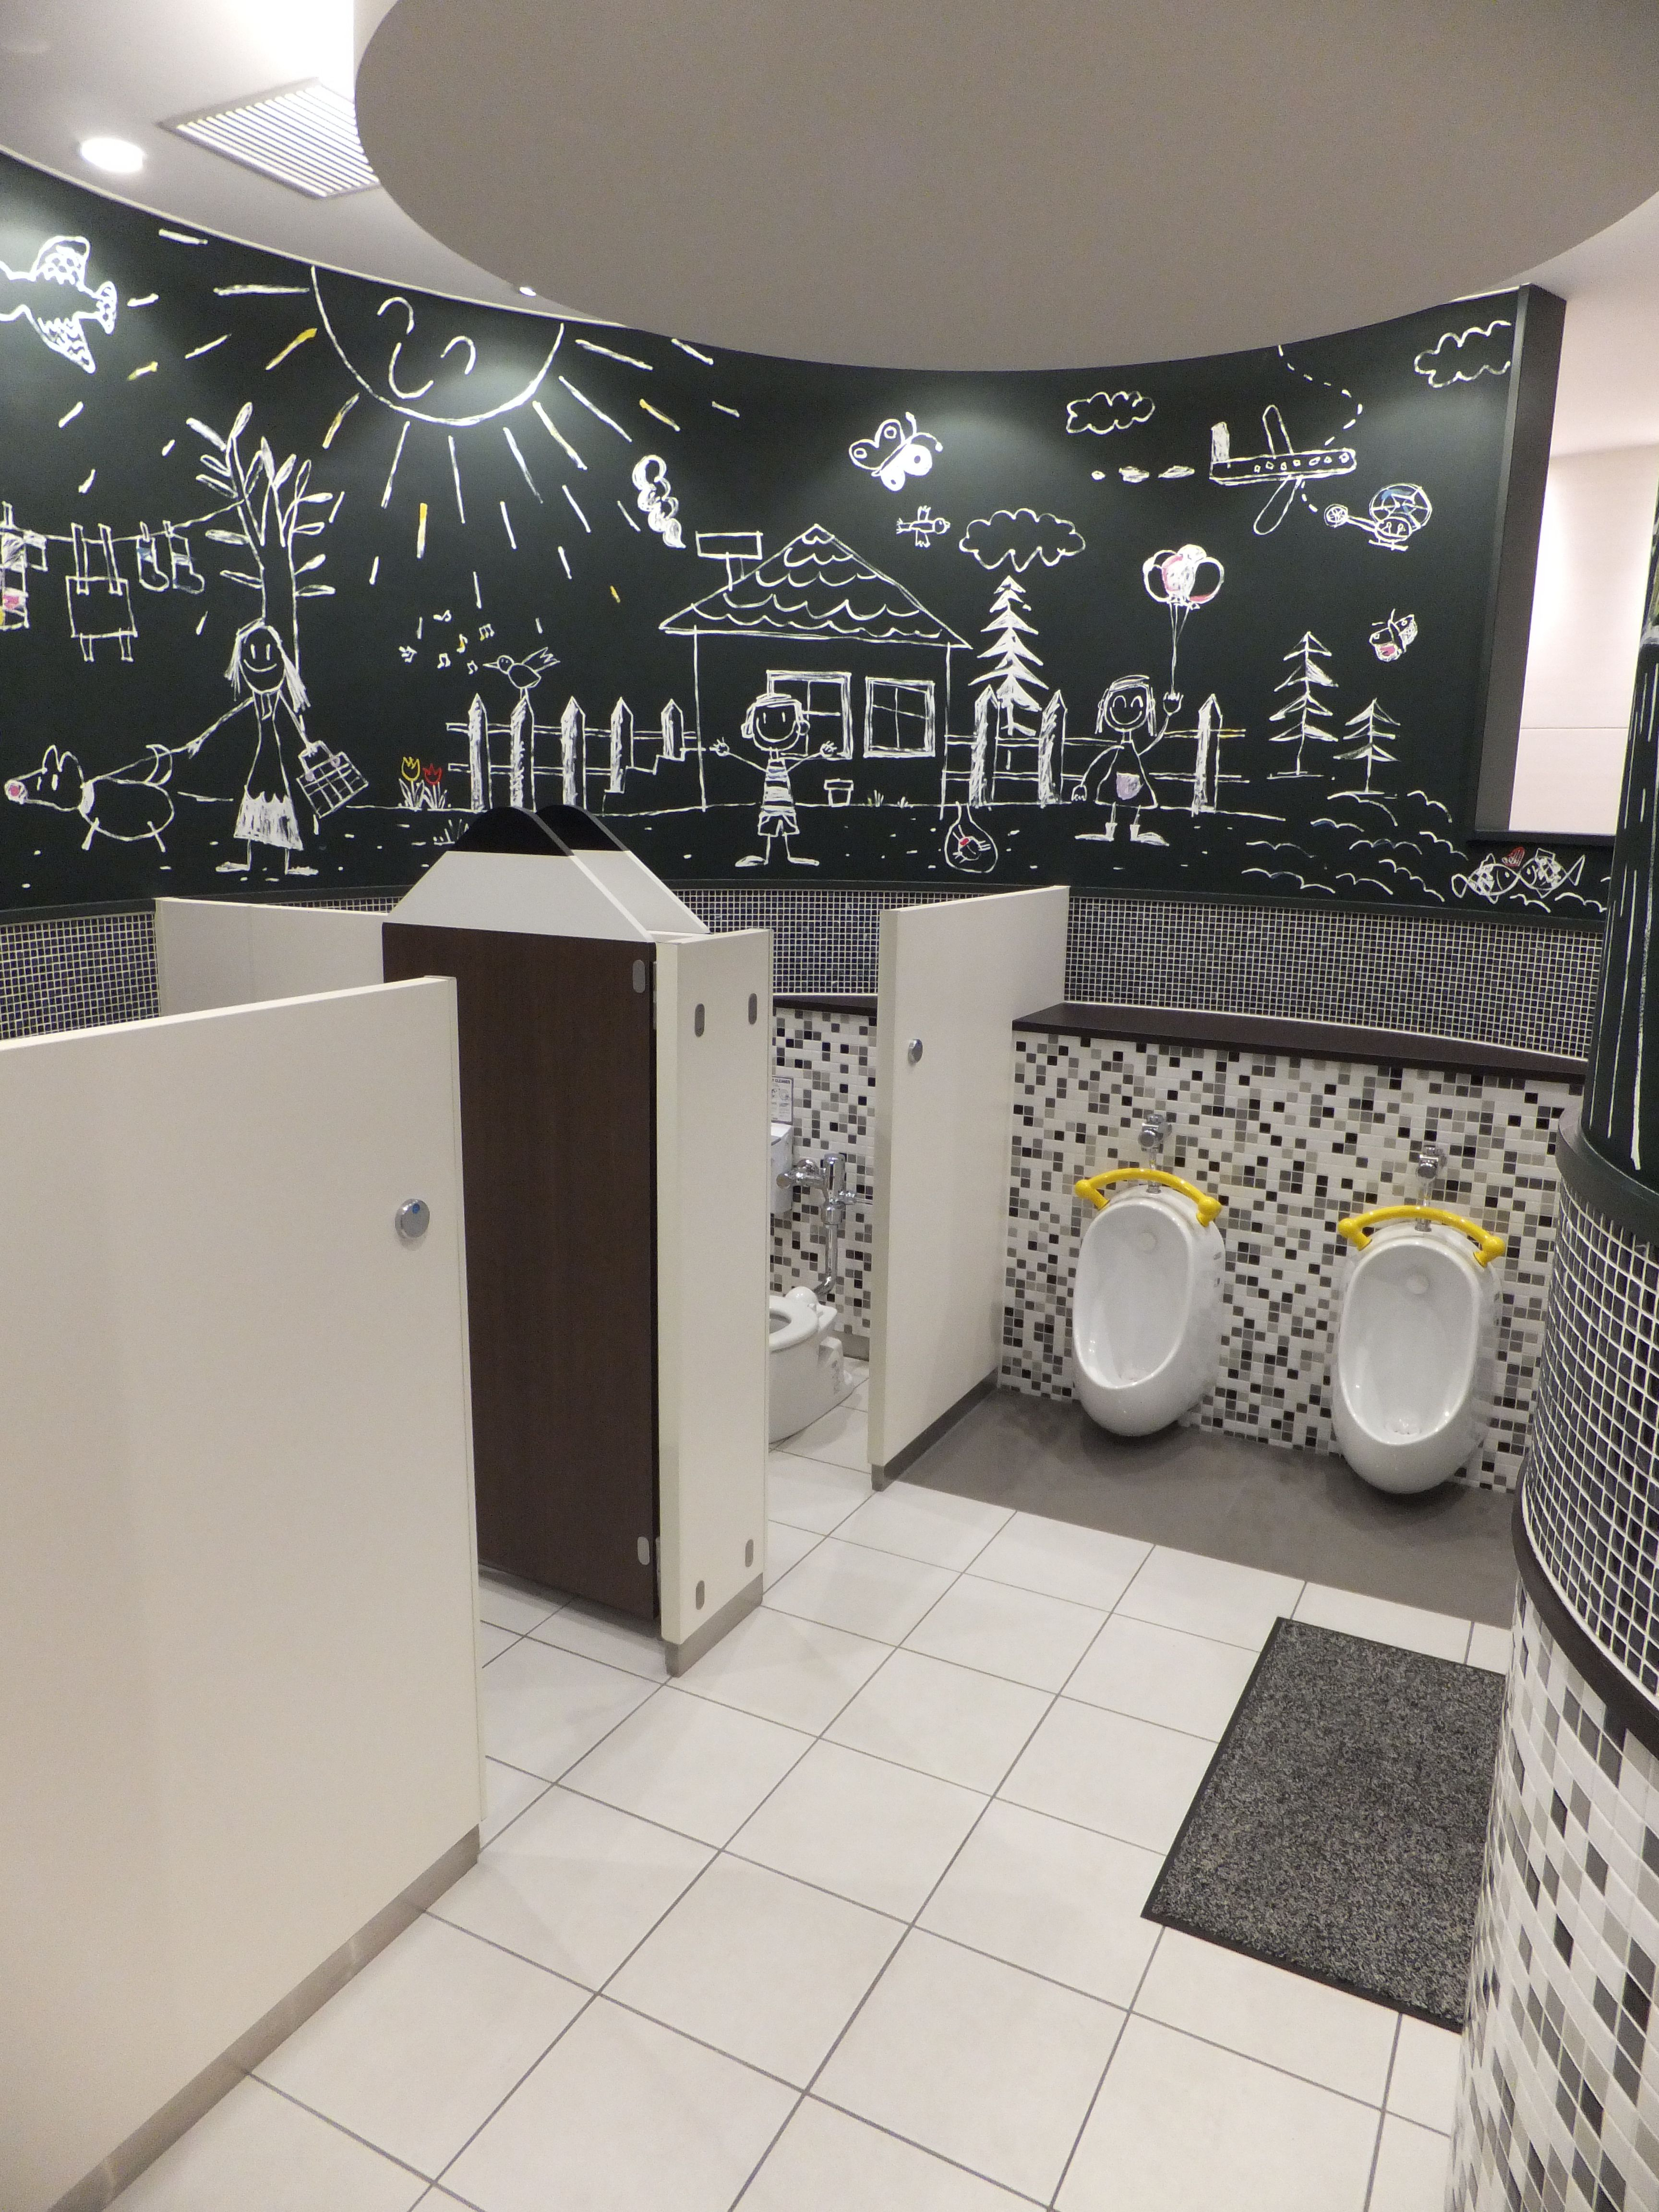 School Bathroom Design Ideas children school restroom | work ideas | pinterest | school, child